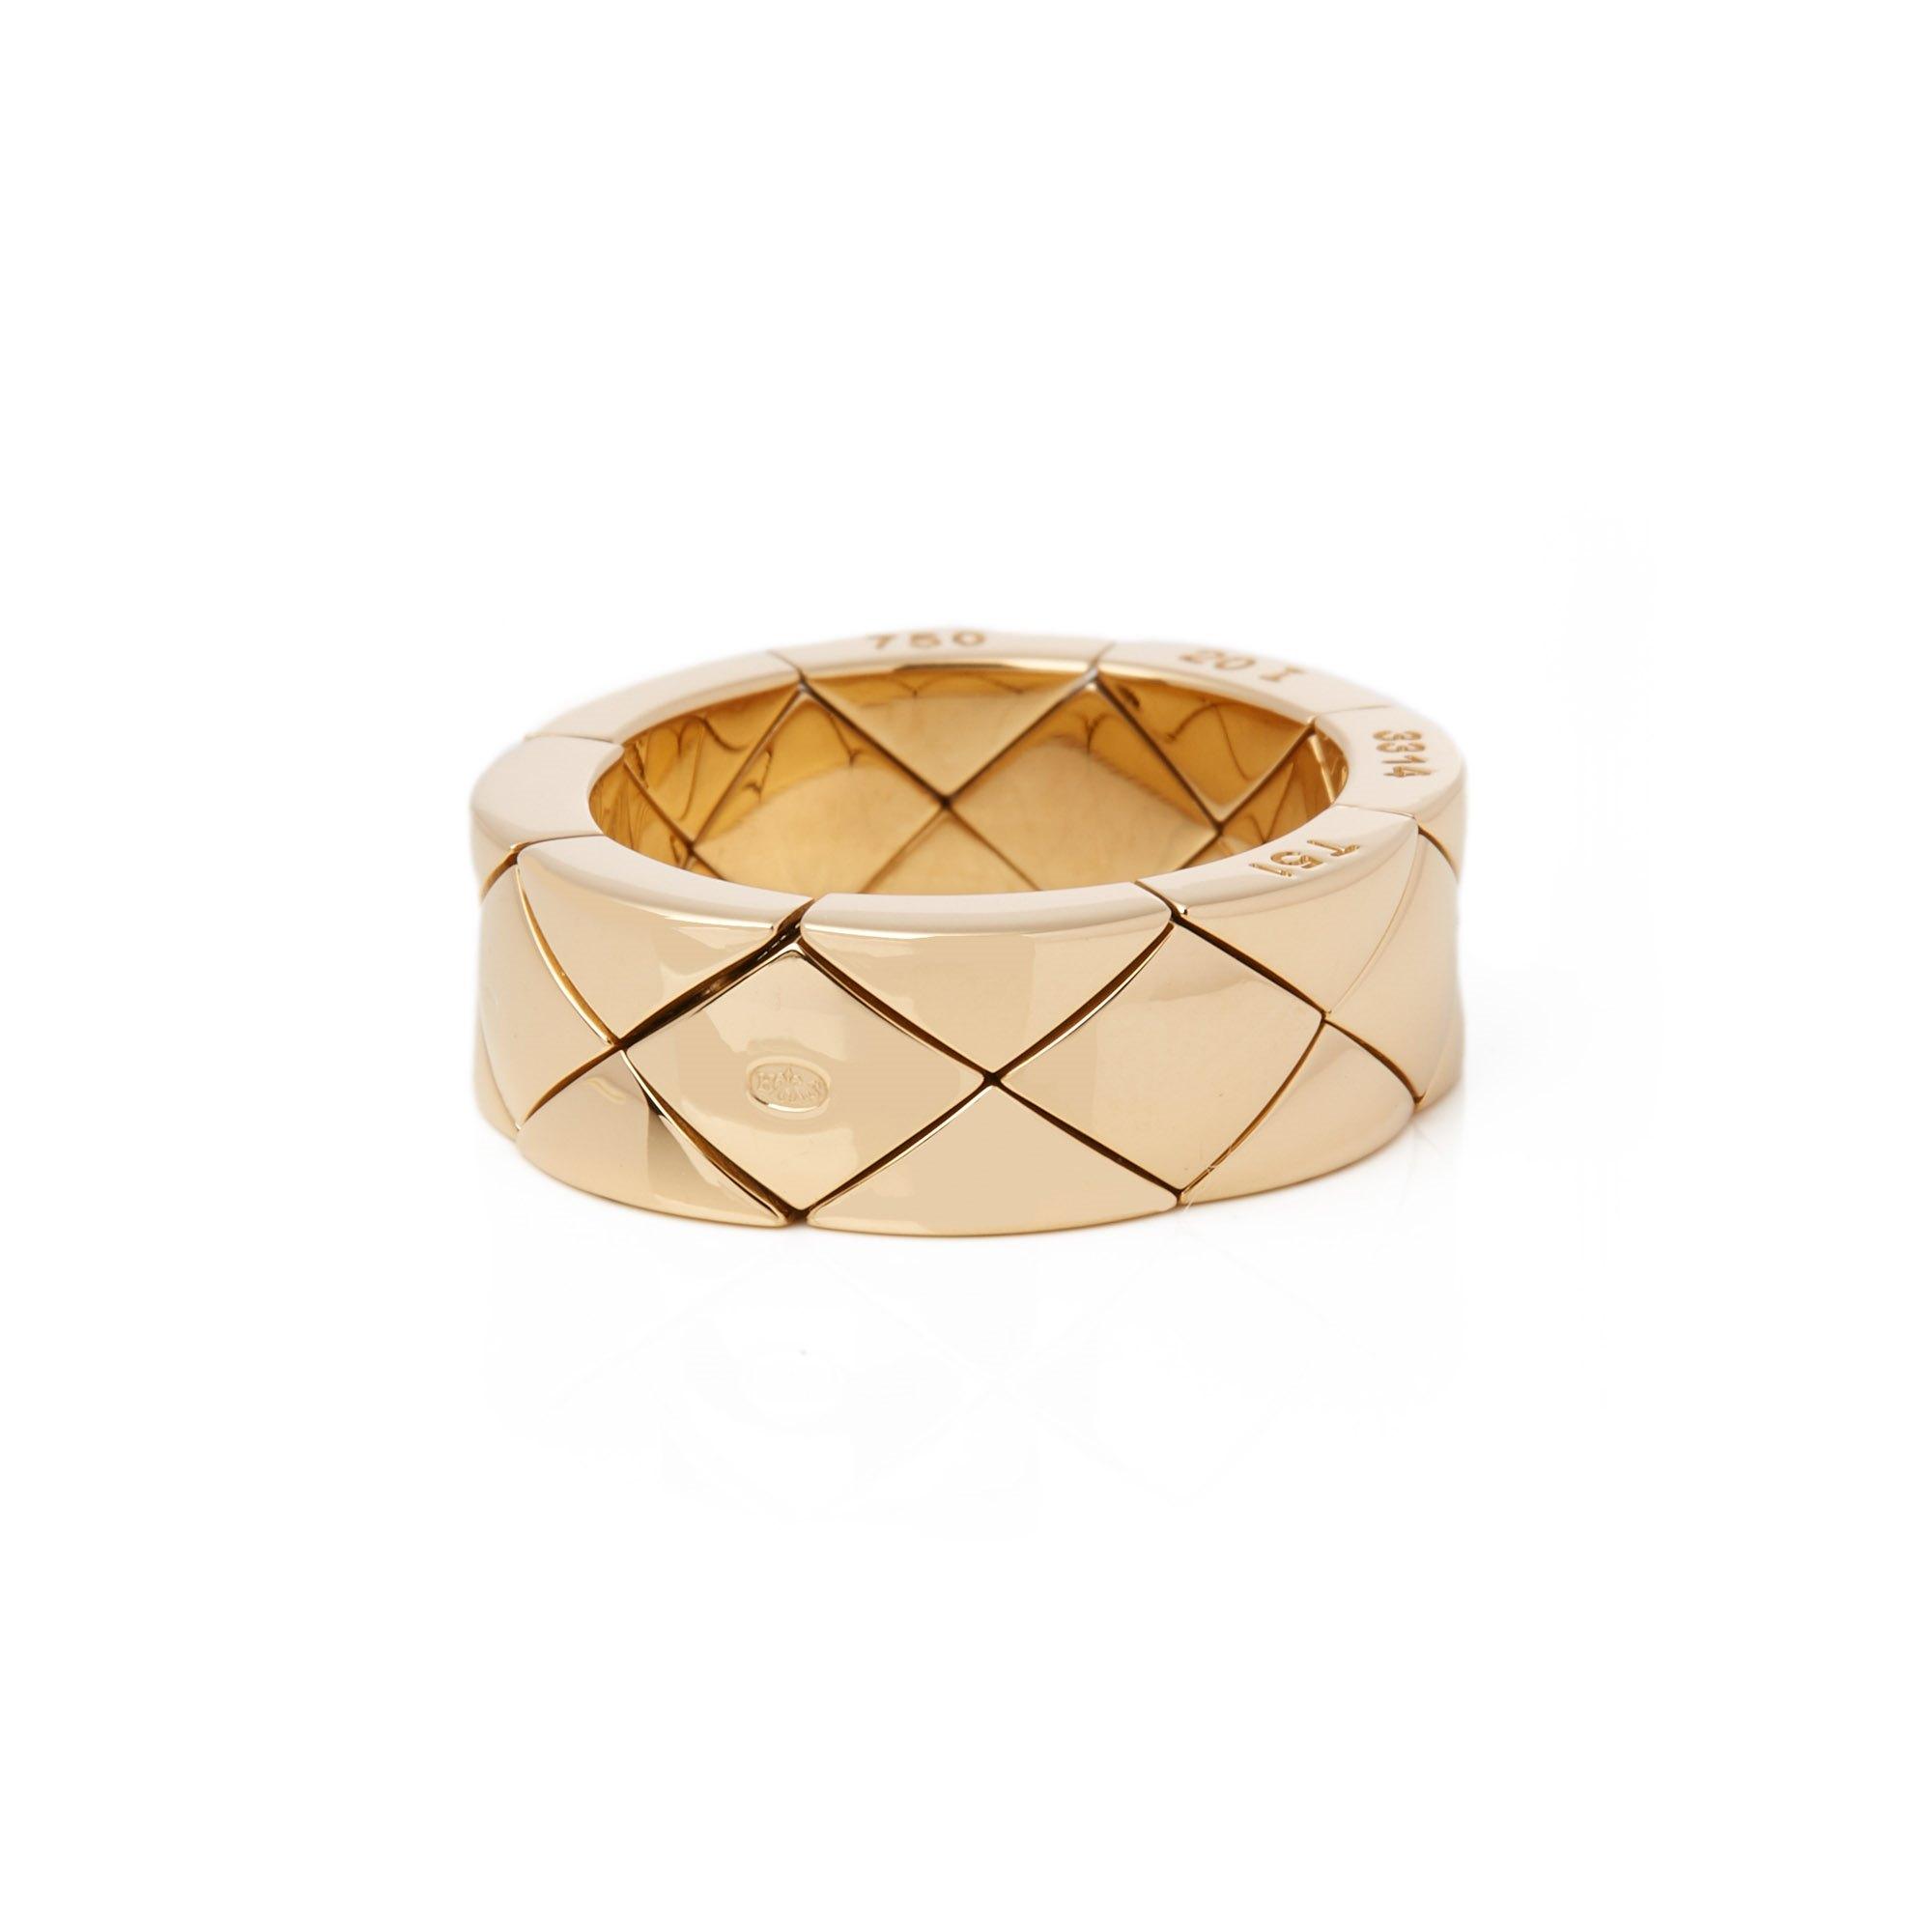 Chanel 18k Yellow Gold Coco Crush Dress Ring